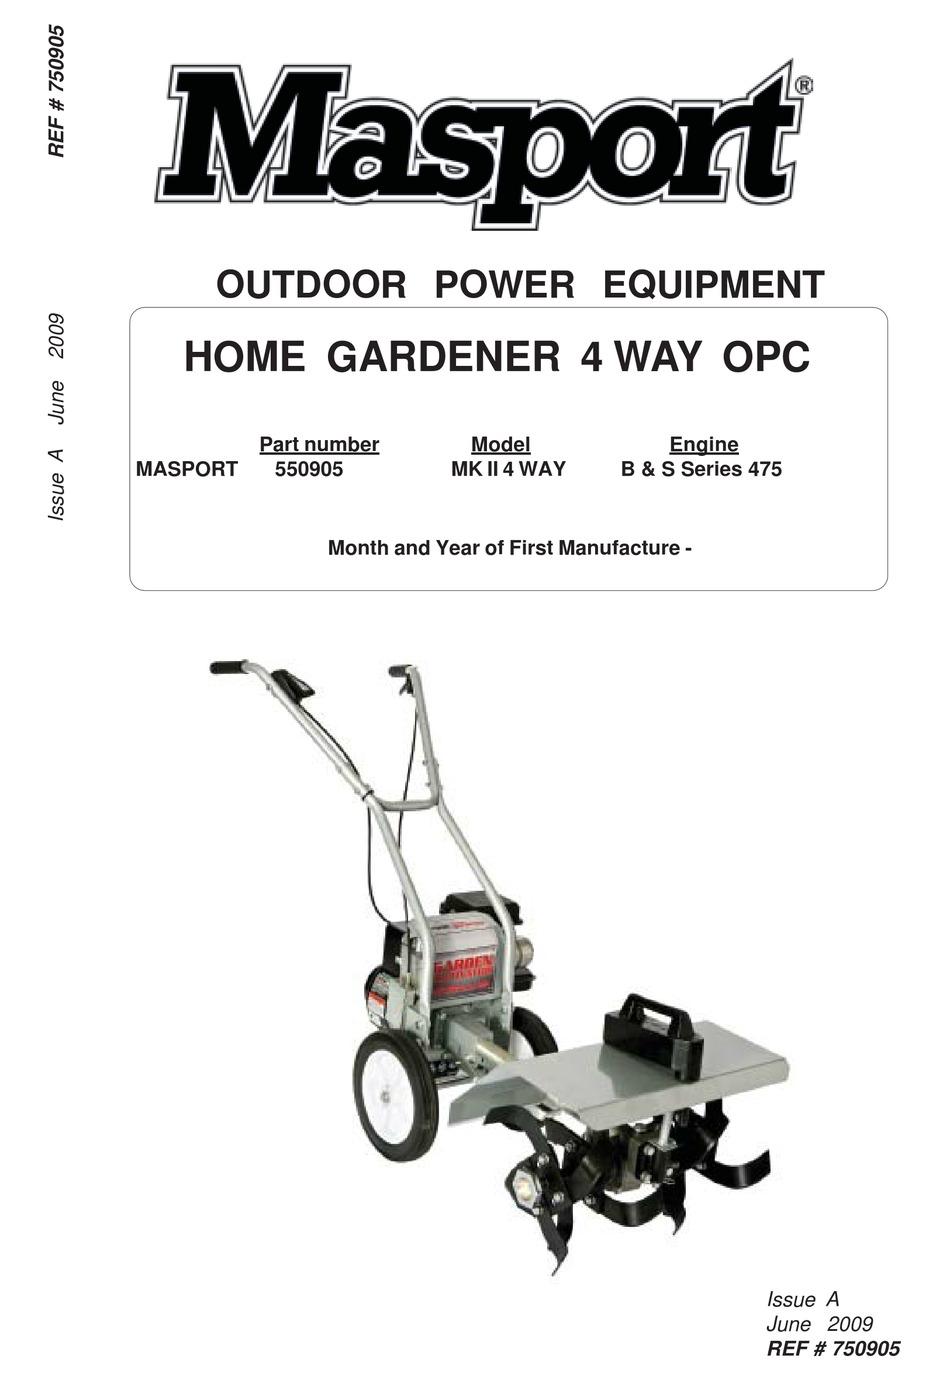 masport mk ii 4 way - Masport 4 Way Home Gardener Manual